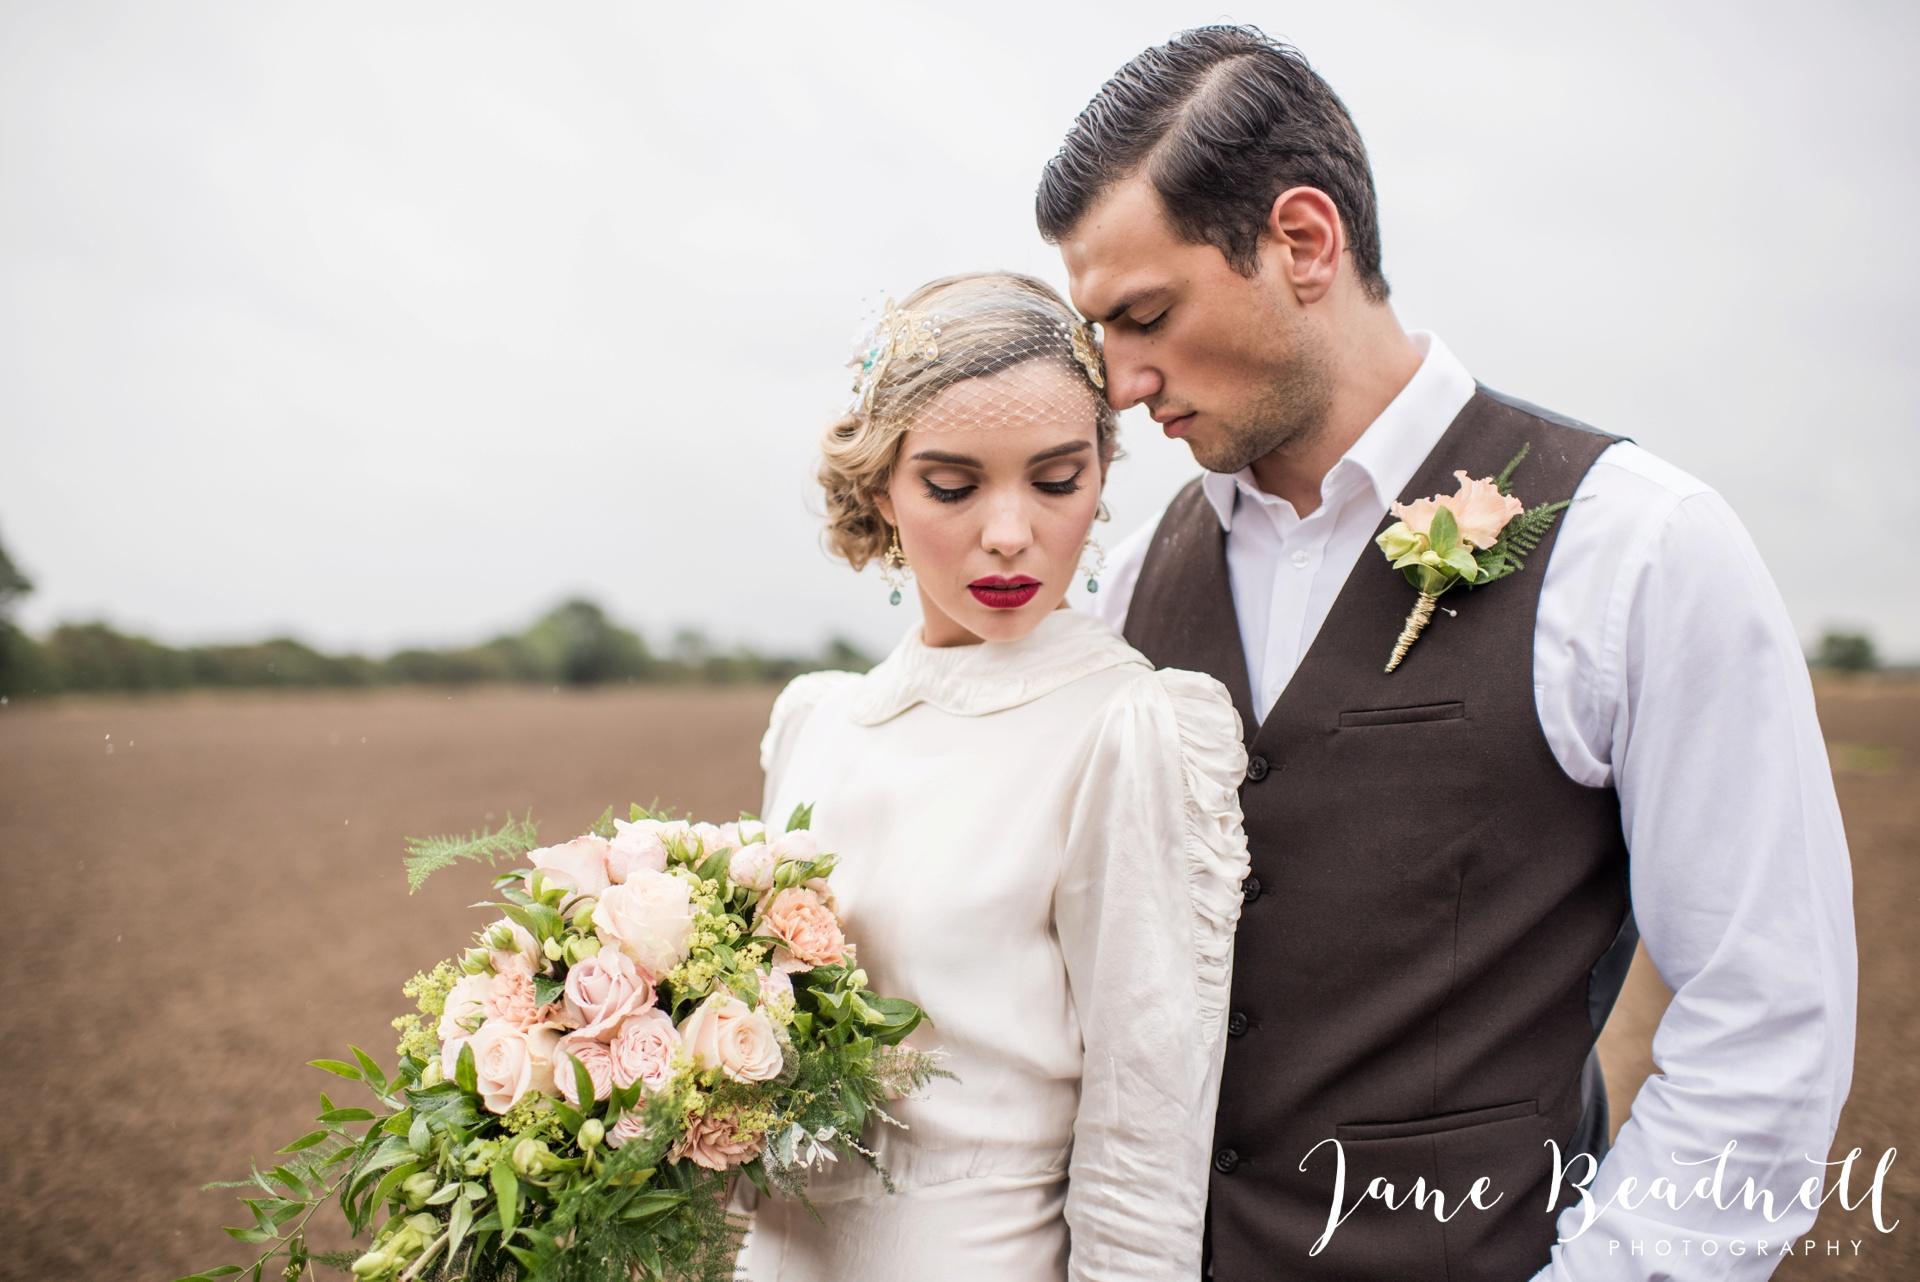 fine-art-wedding-photographer-jane-beadnell-photography_0015